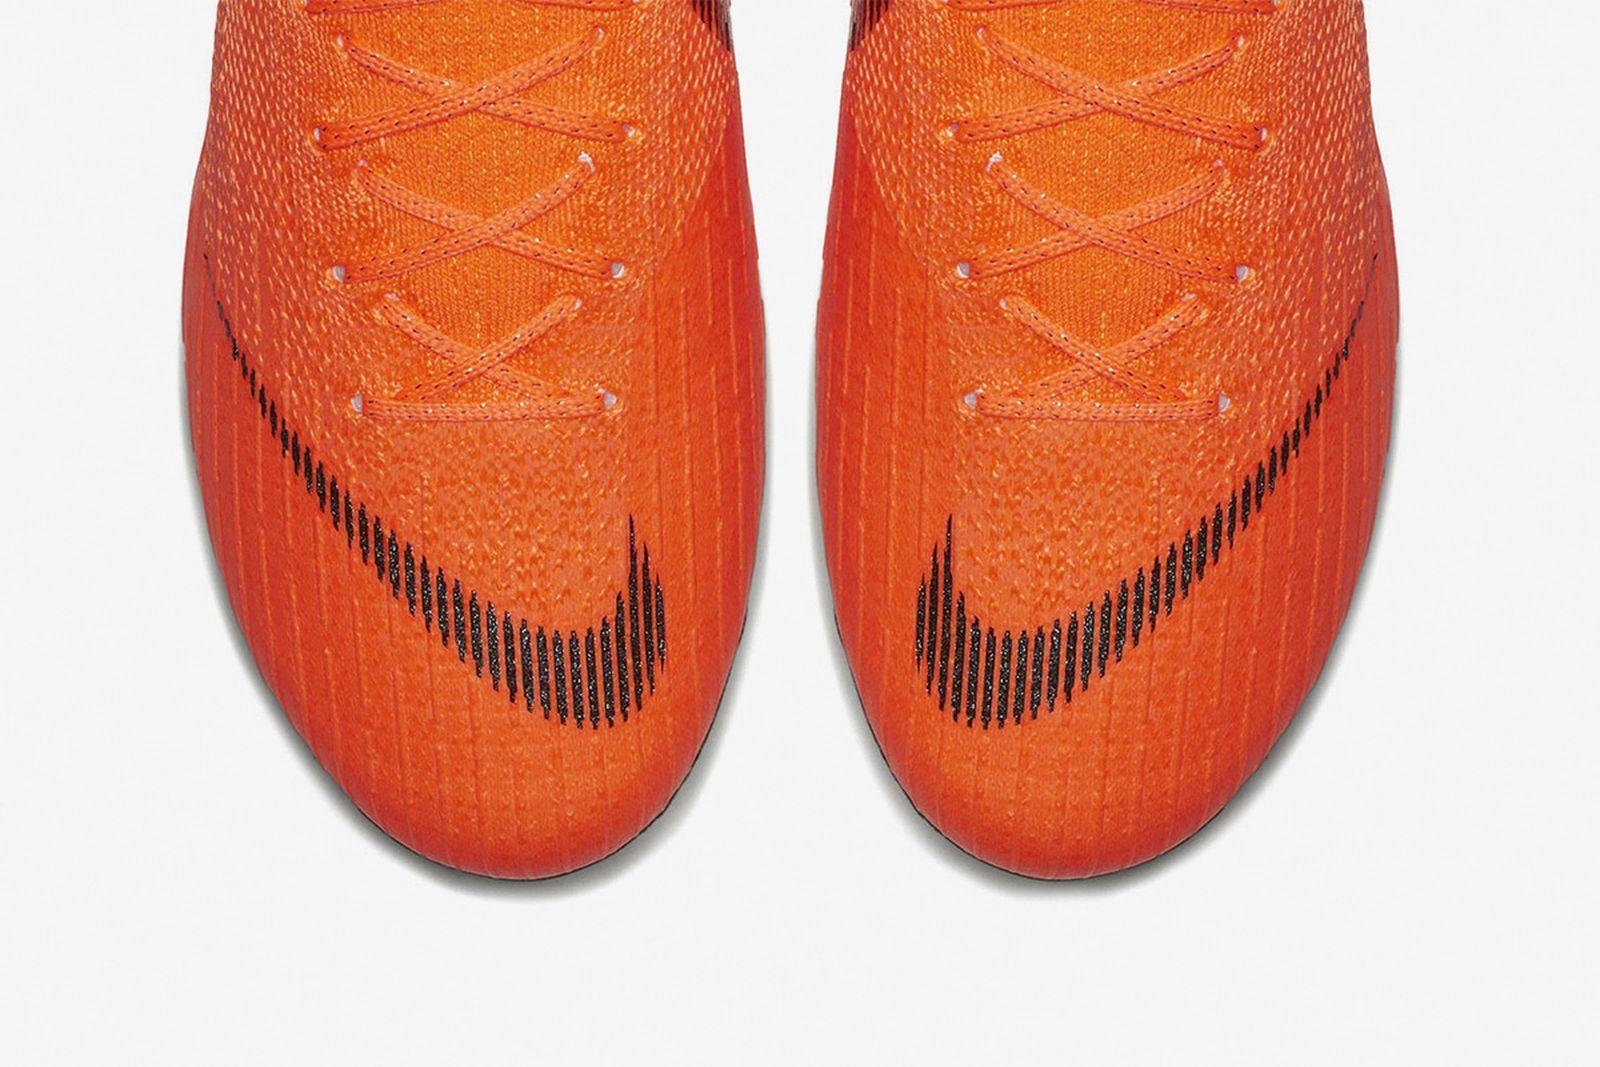 nike-mercurial-superfly-football-boot-025